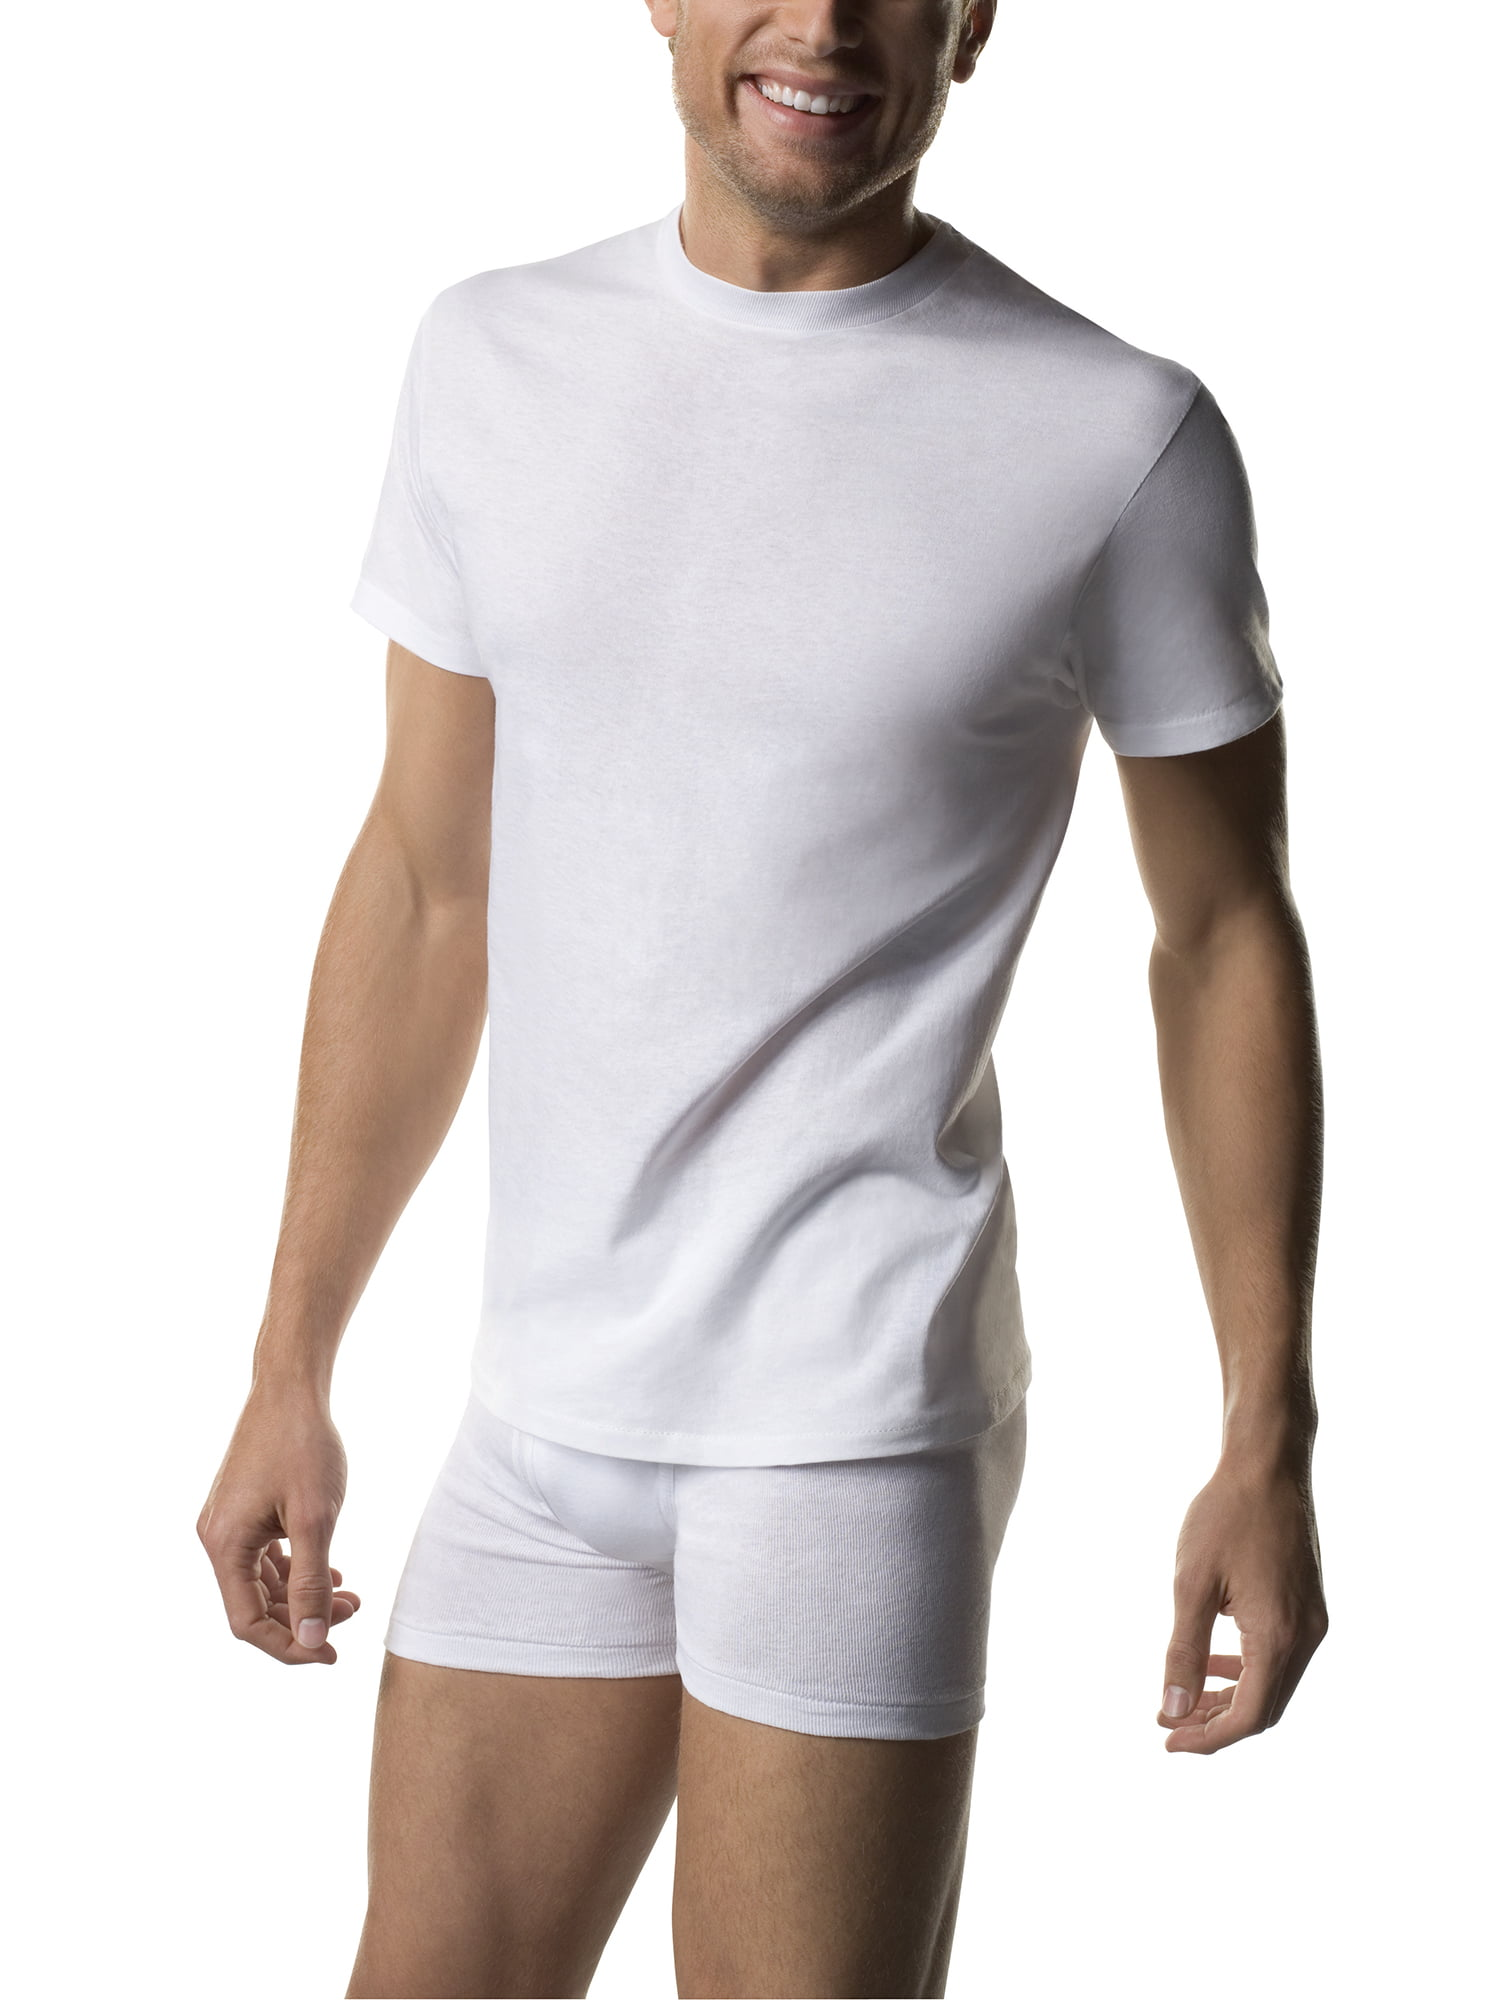 9d8d60abe4cd Hanes - Hanes Men's ComfortSoft White Cotton Tagless T-Shirts, 3 Pack, S -  Walmart.com